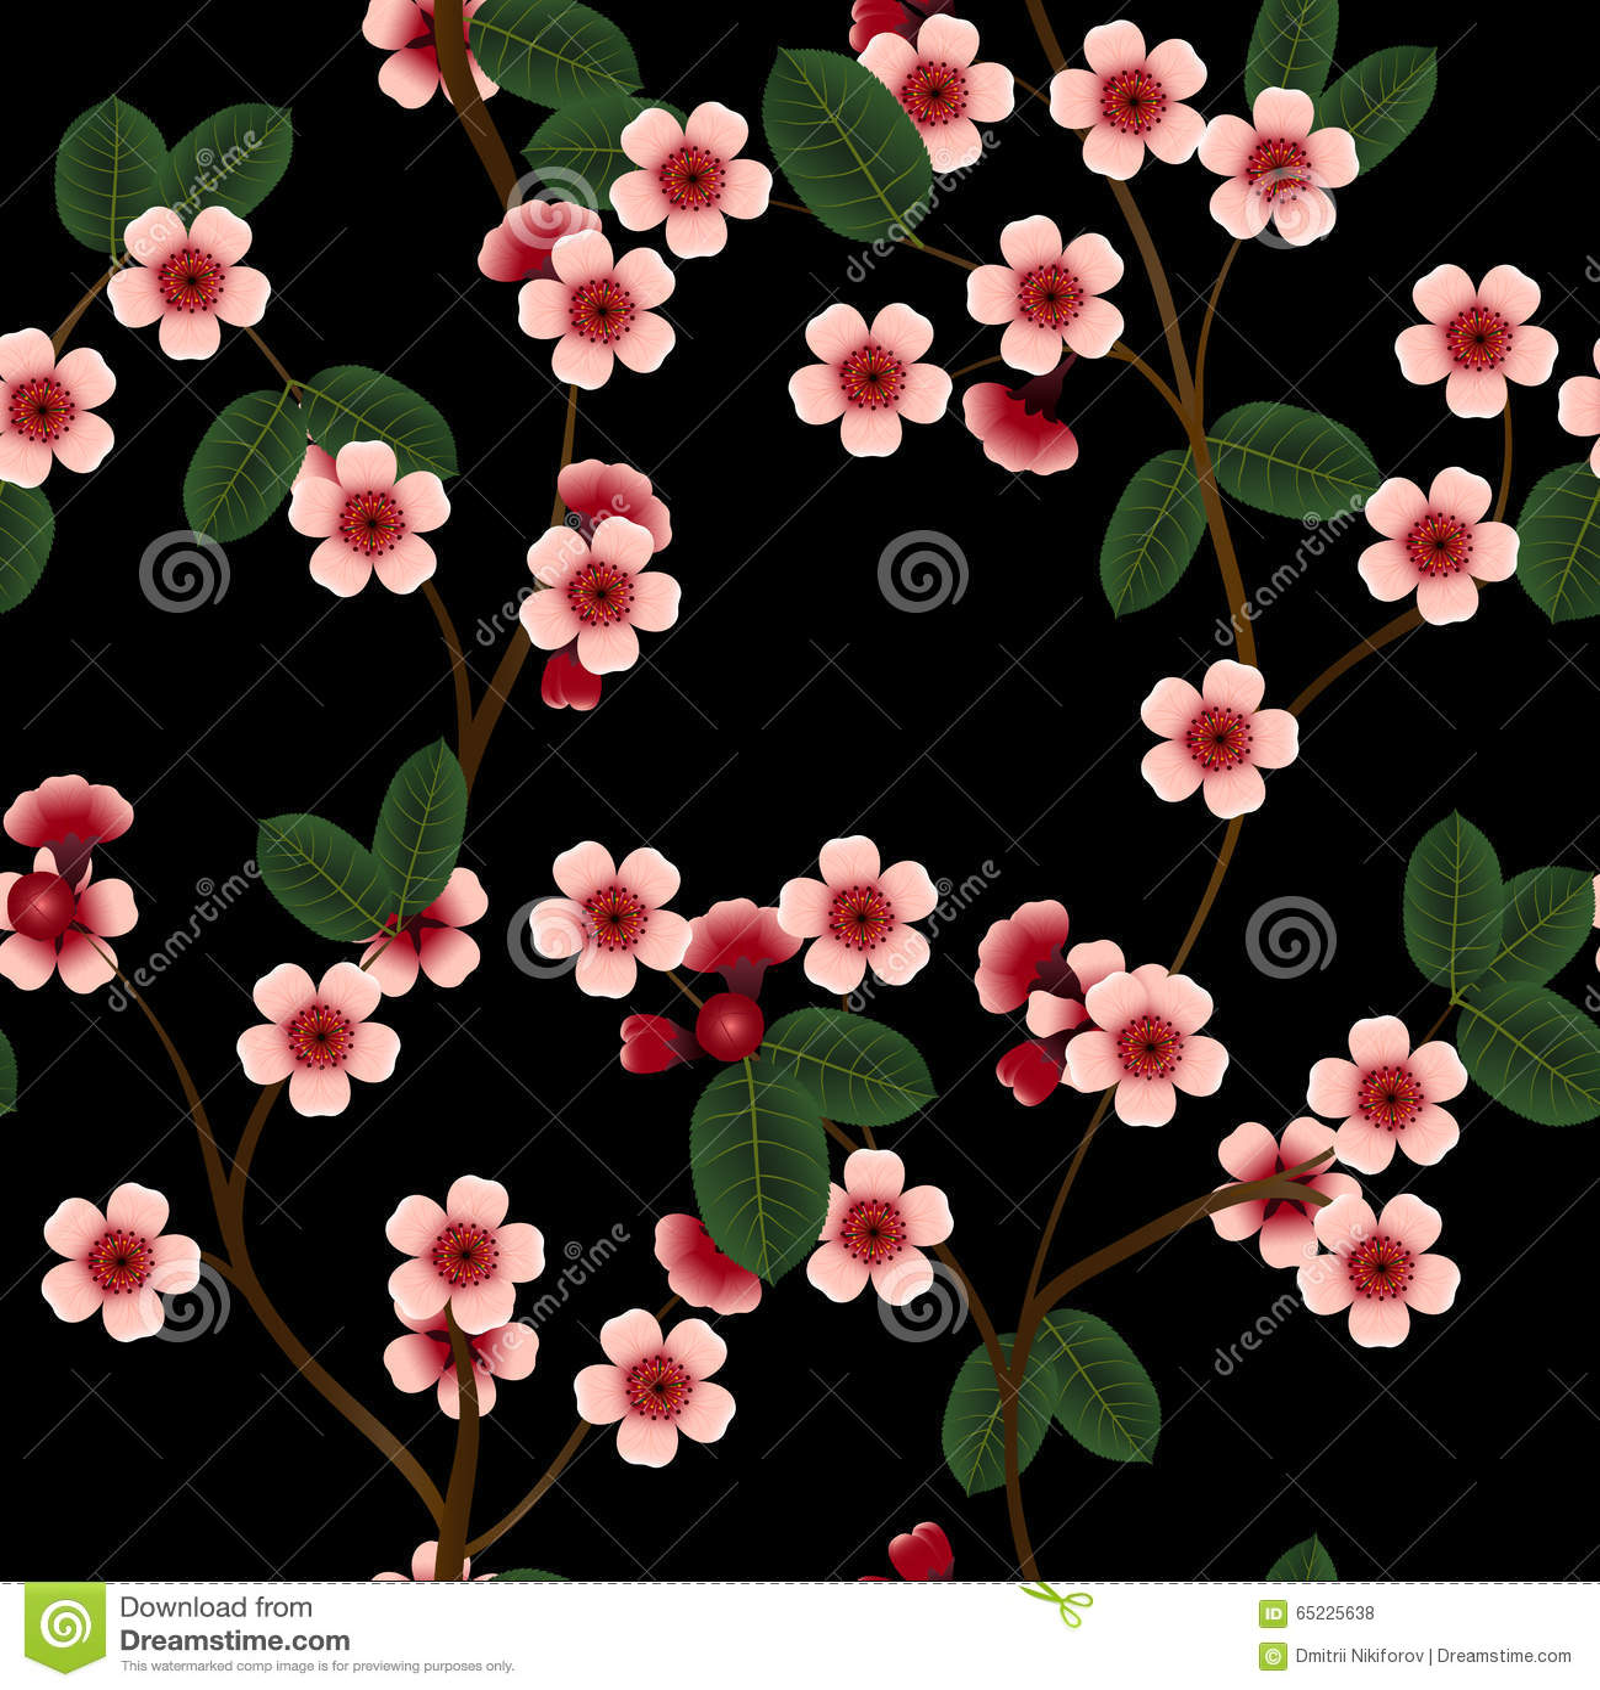 Безшовная картина с розовыми цветками и лист вишни